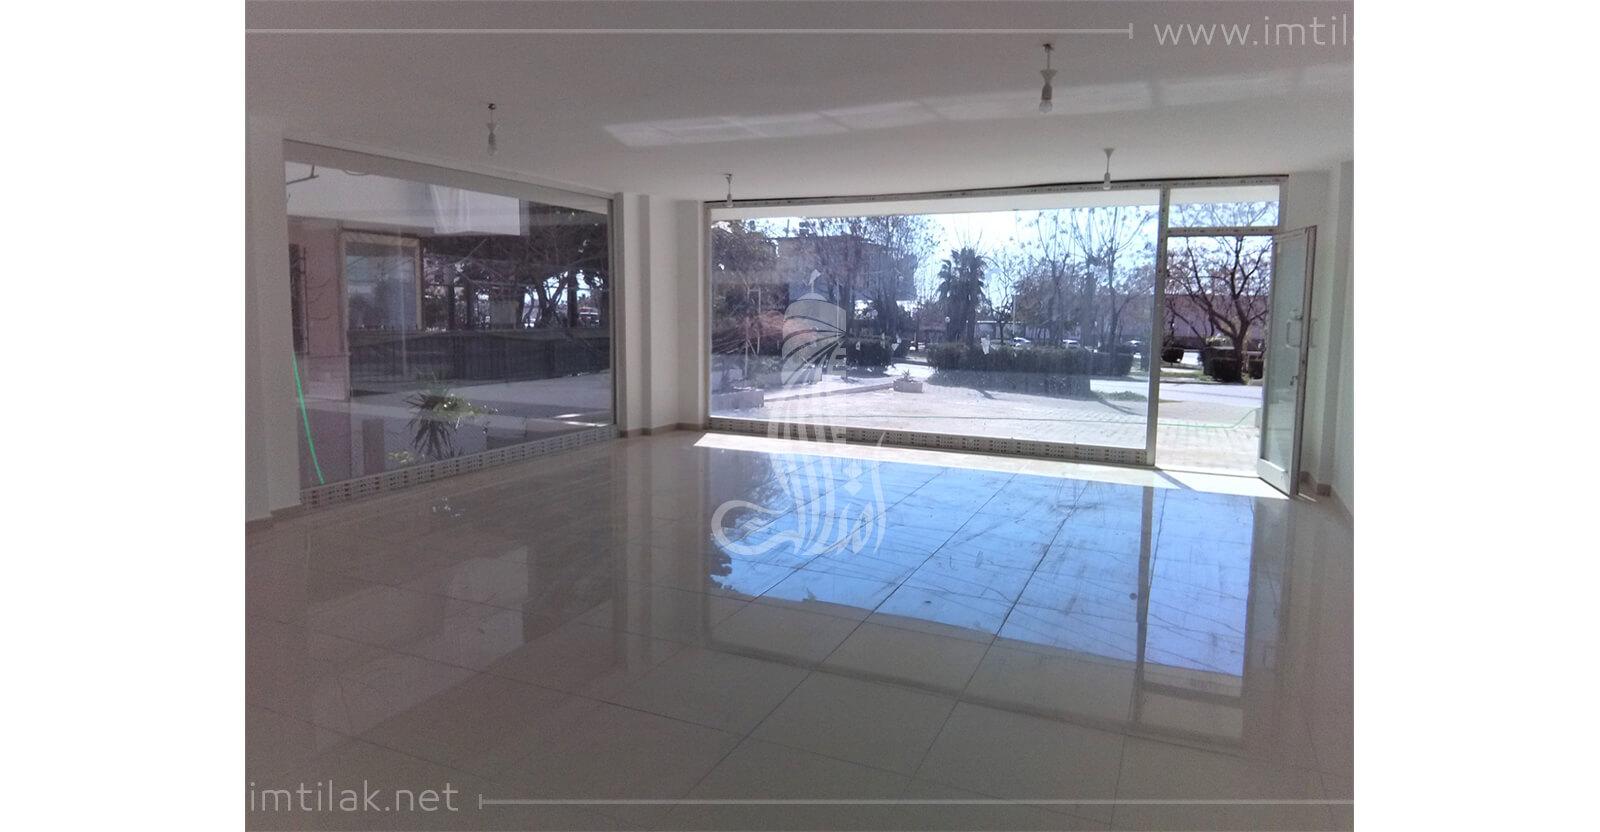 Shanley Commercial Center  IMT - 778